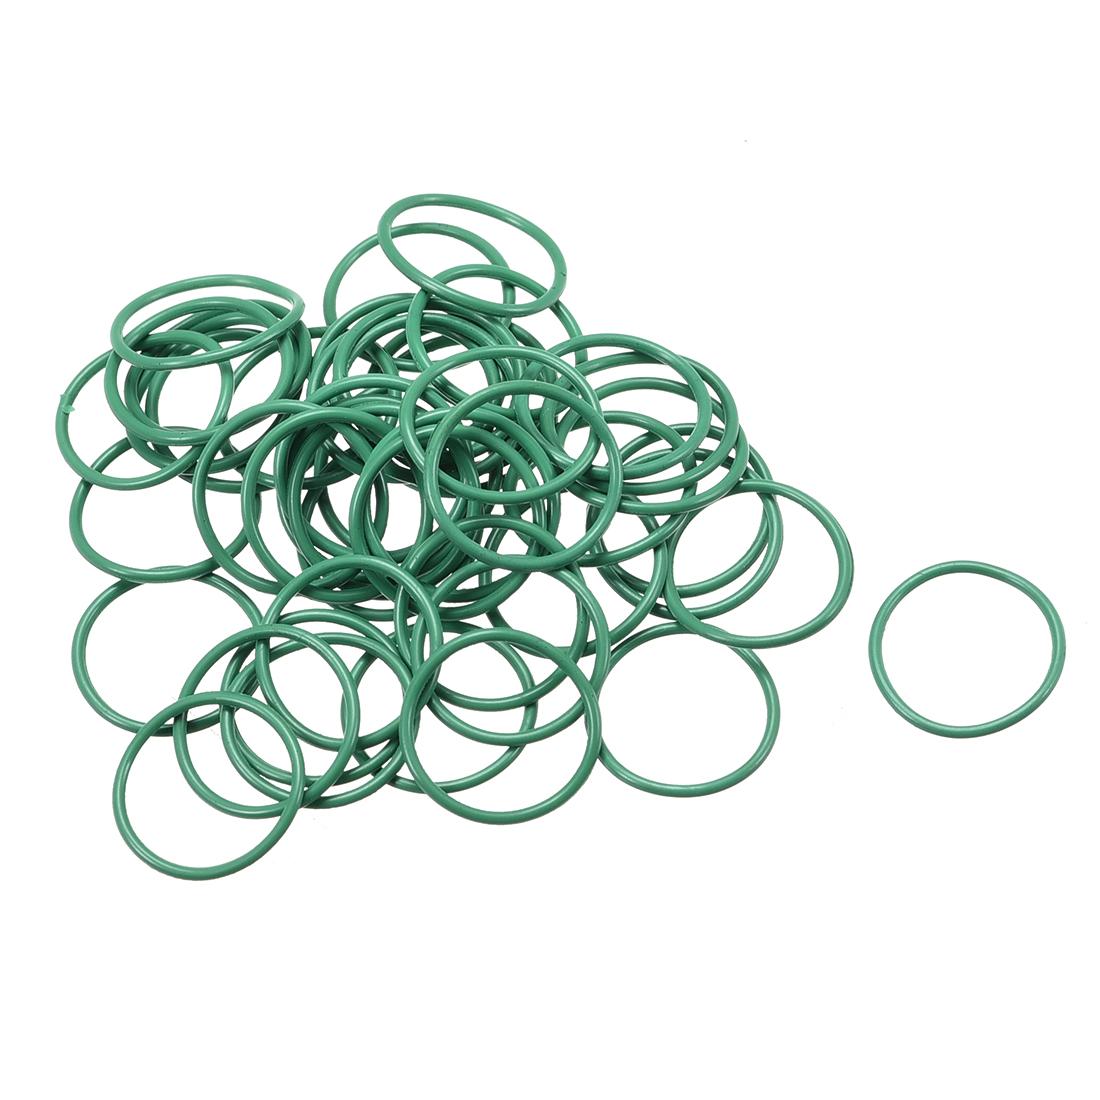 20Pcs 14mm x 1mm FKM Fluoro Rubber O-rings Heat Resistant Sealing Ring Grommets